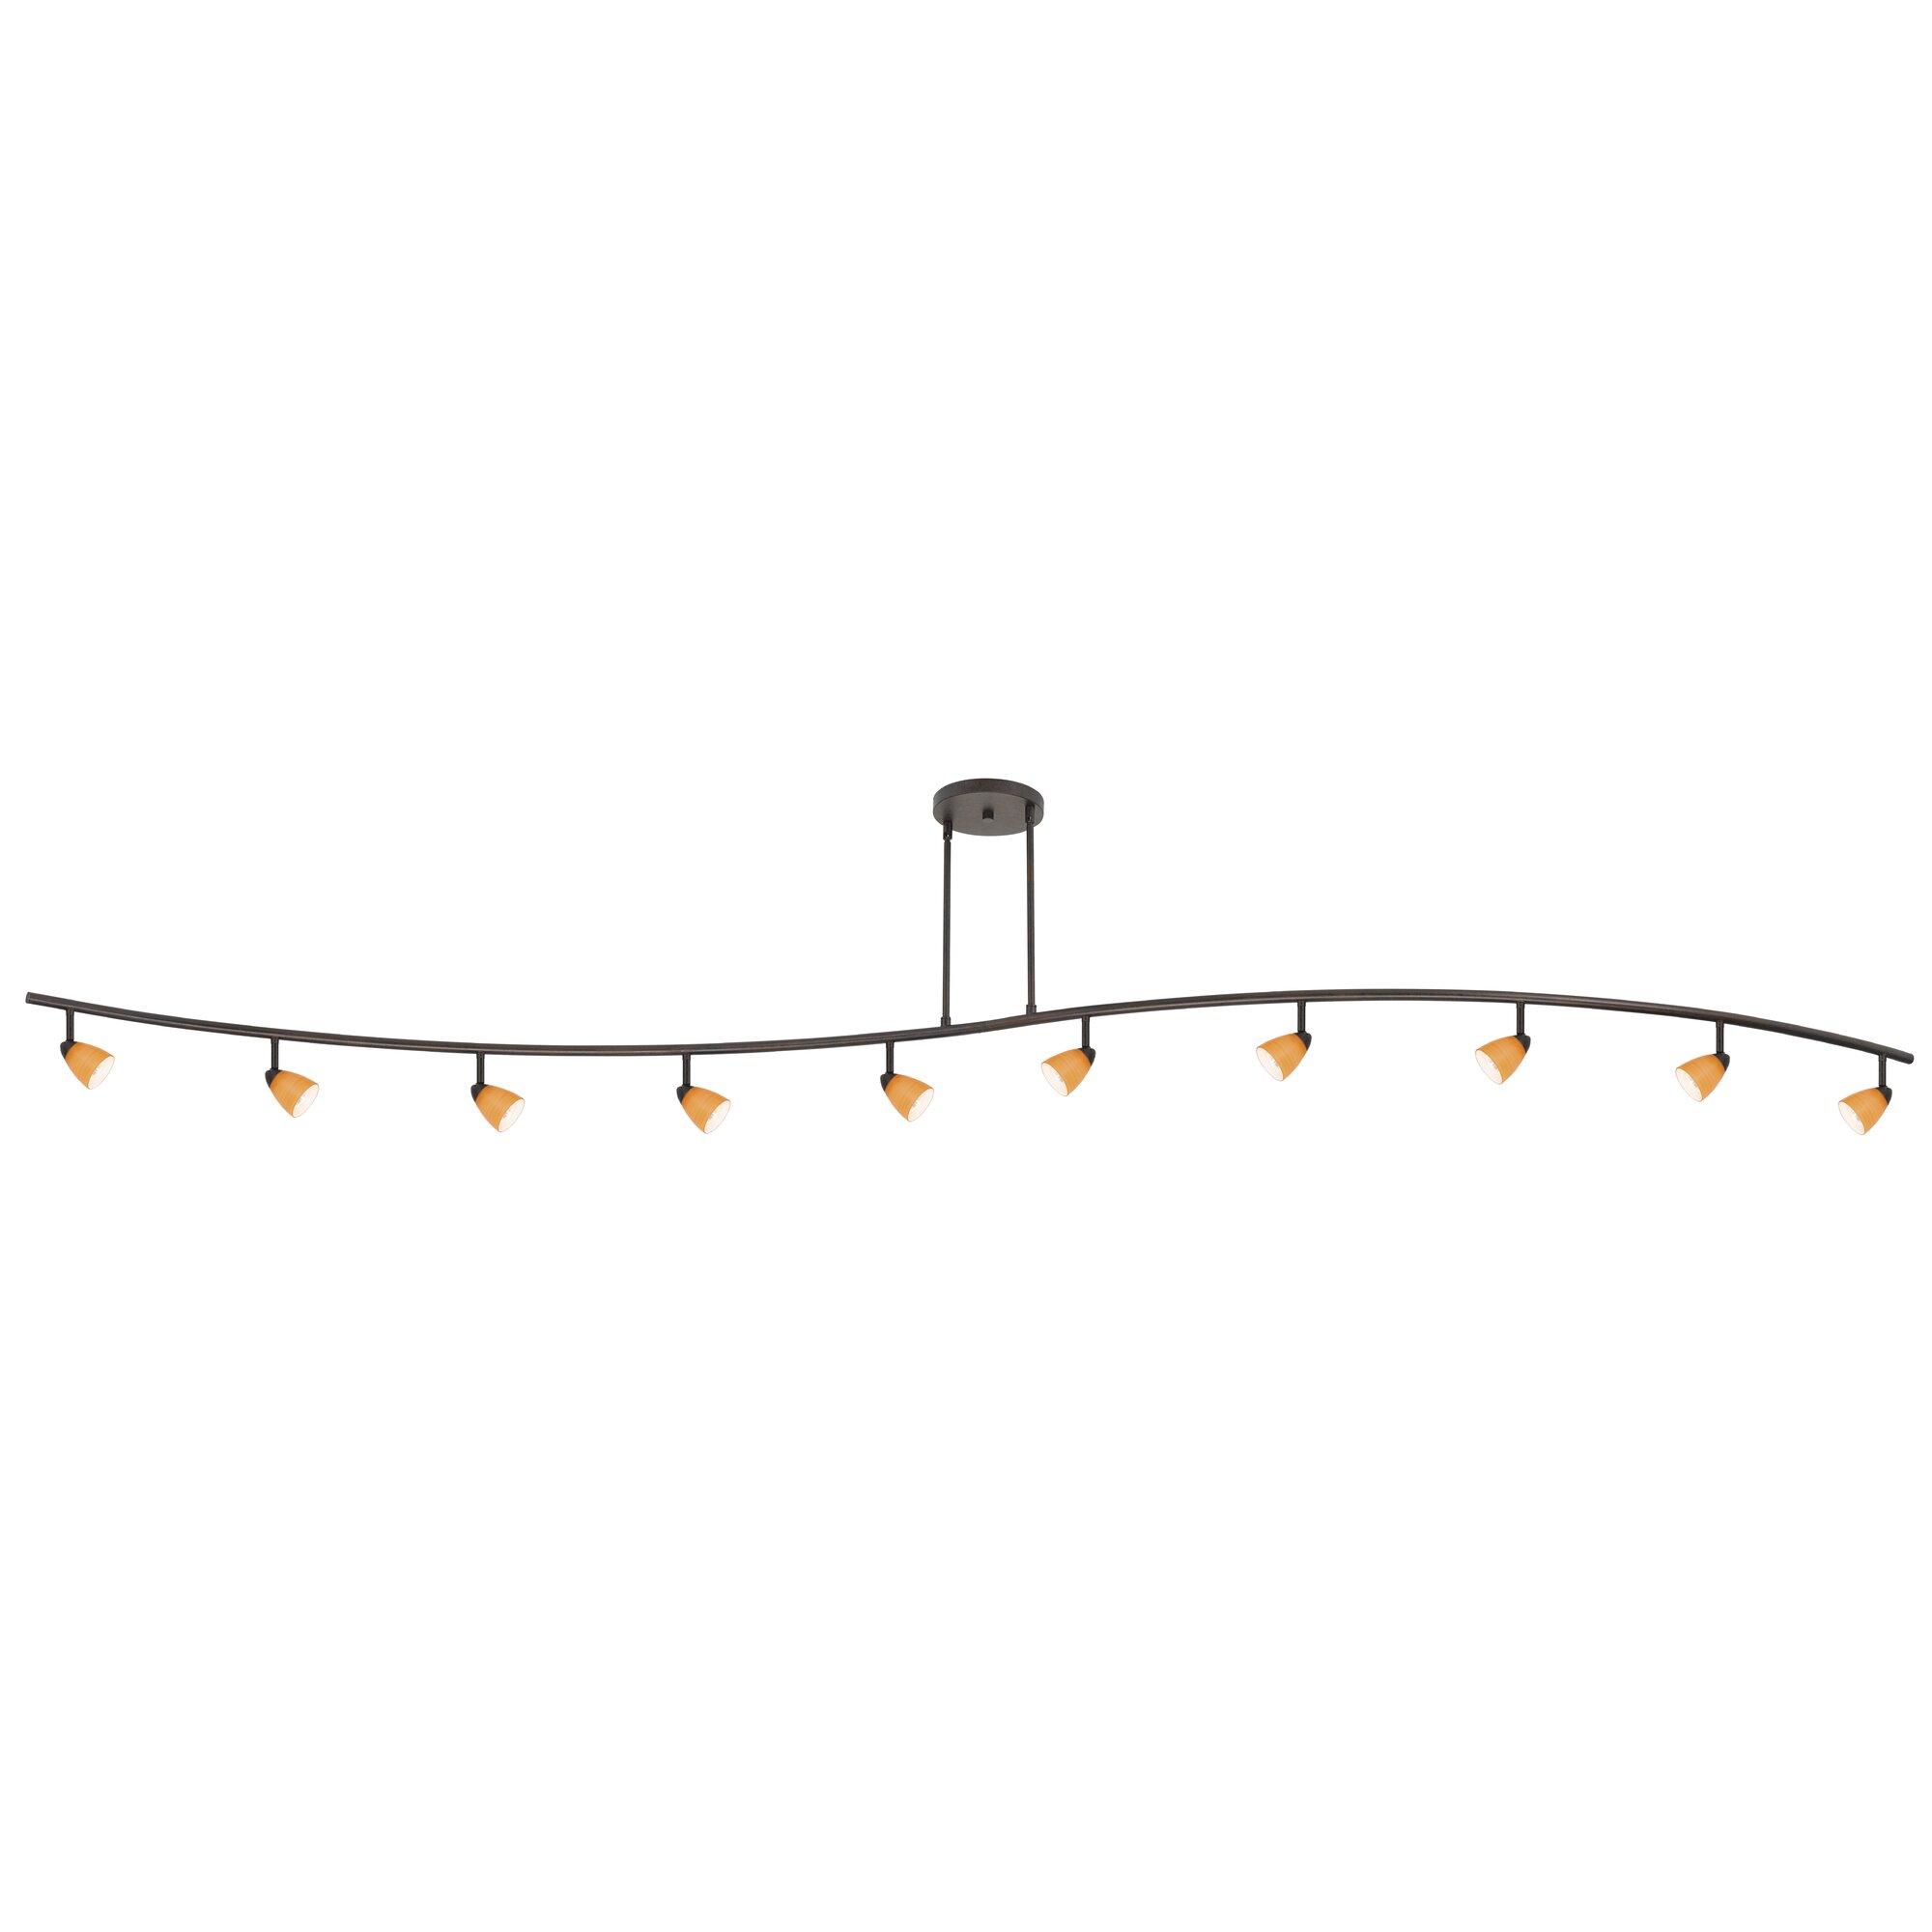 industrial track lighting industrial track lighting zoom. industrial track lighting zoom alberto 10light full kit with glass u